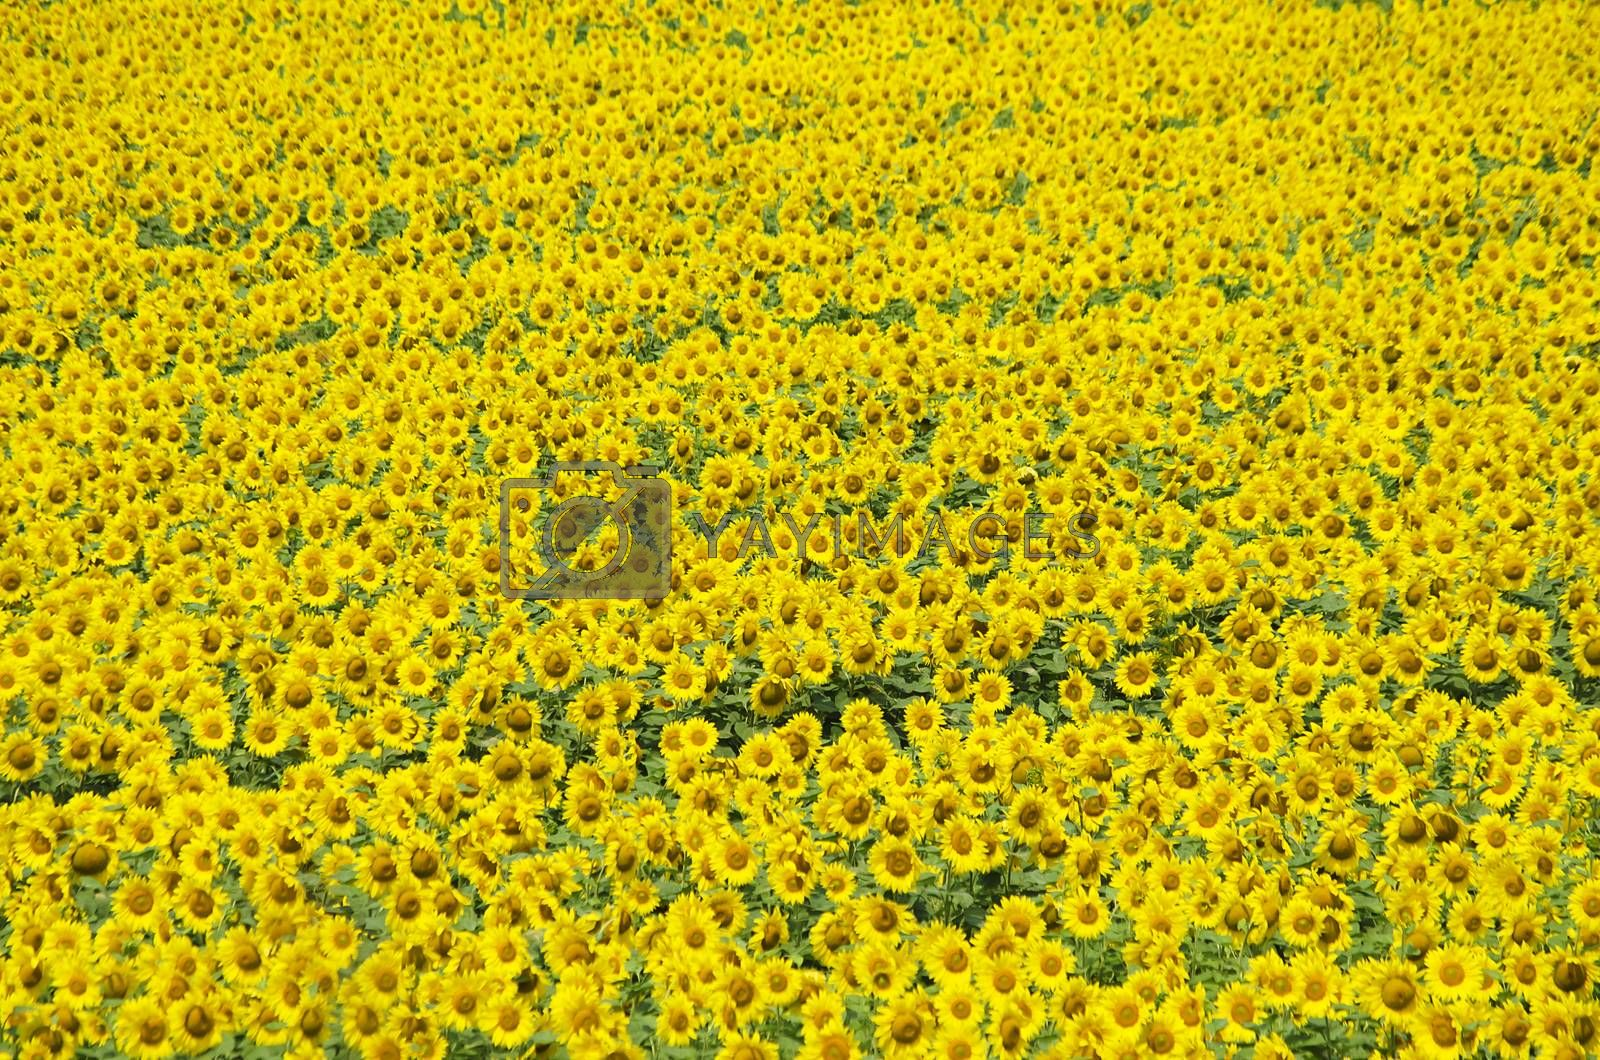 Summer Yellow Natural Sunflower Background